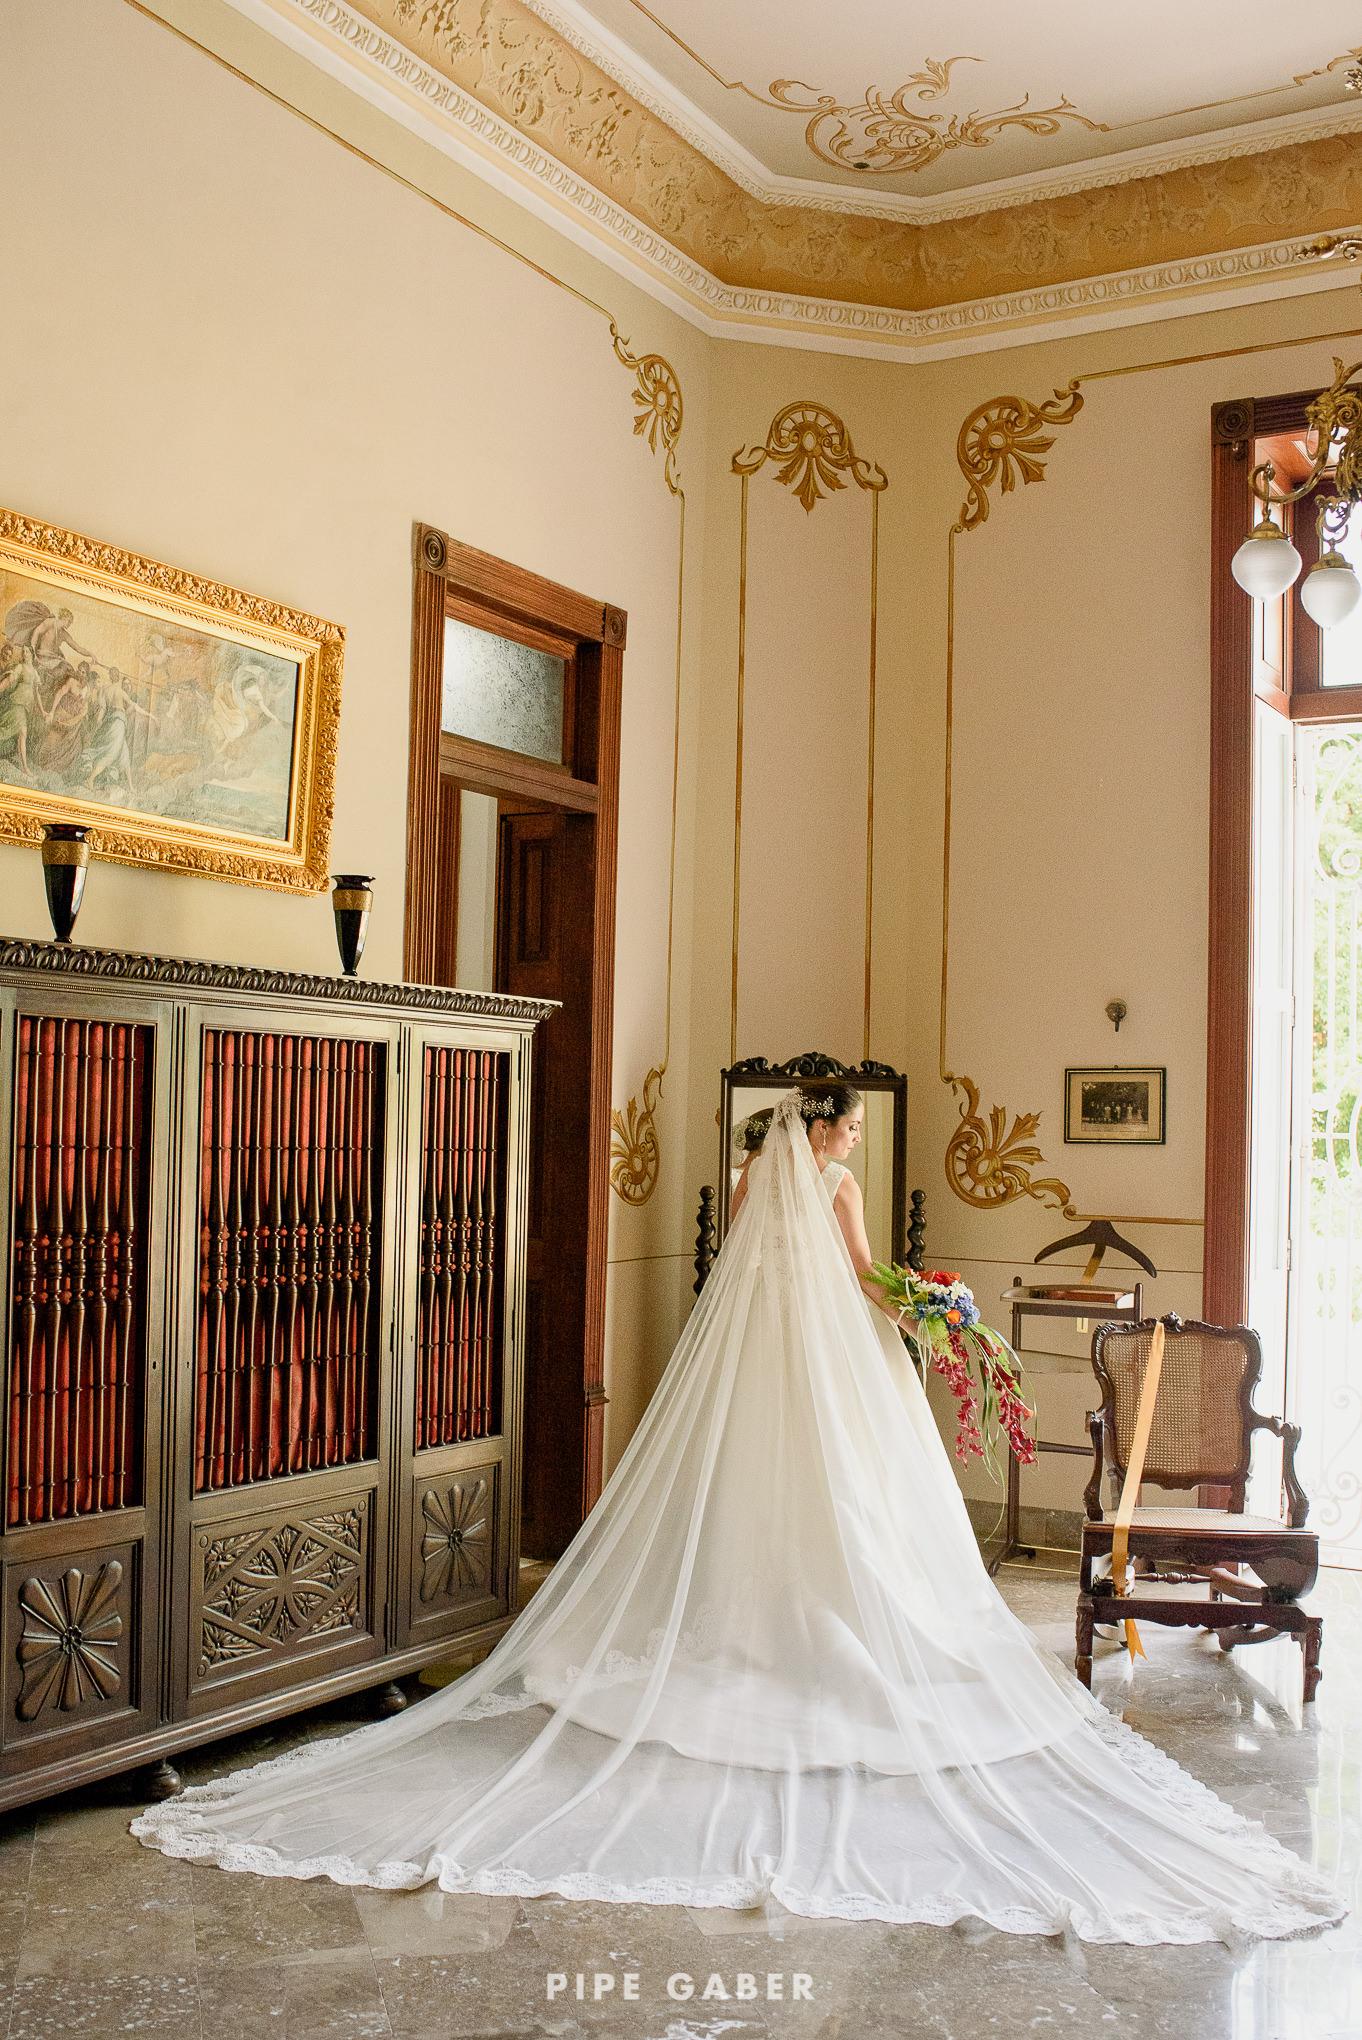 17_02_18_WEDDING_AIDITA_NEZBIT_MIGUEL_DOGRE_100_web.jpg